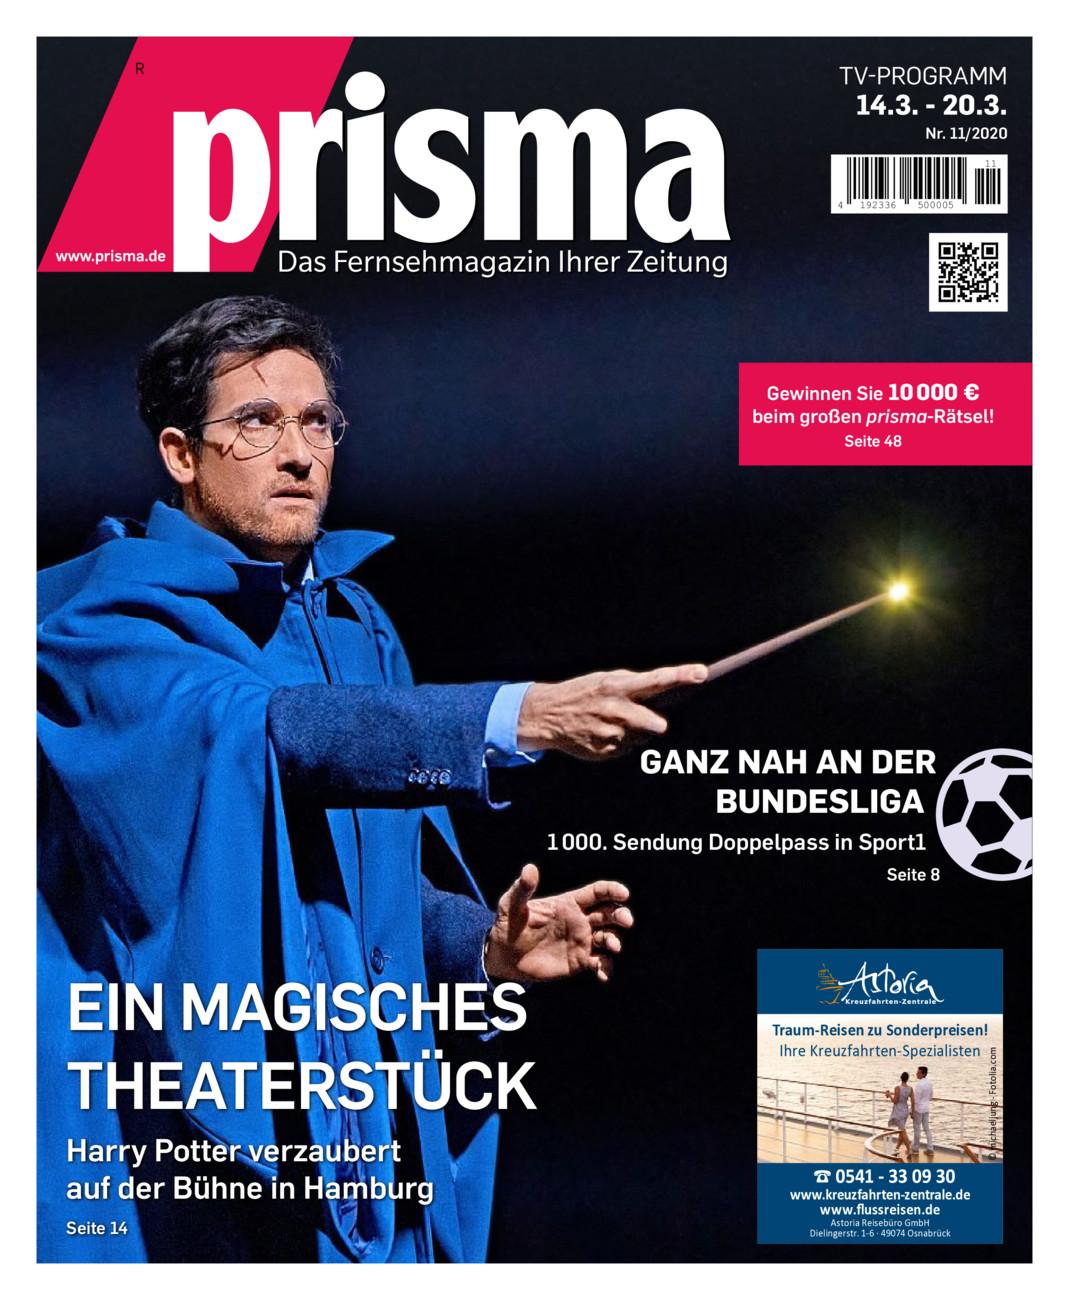 Prisma 14. - 20.3